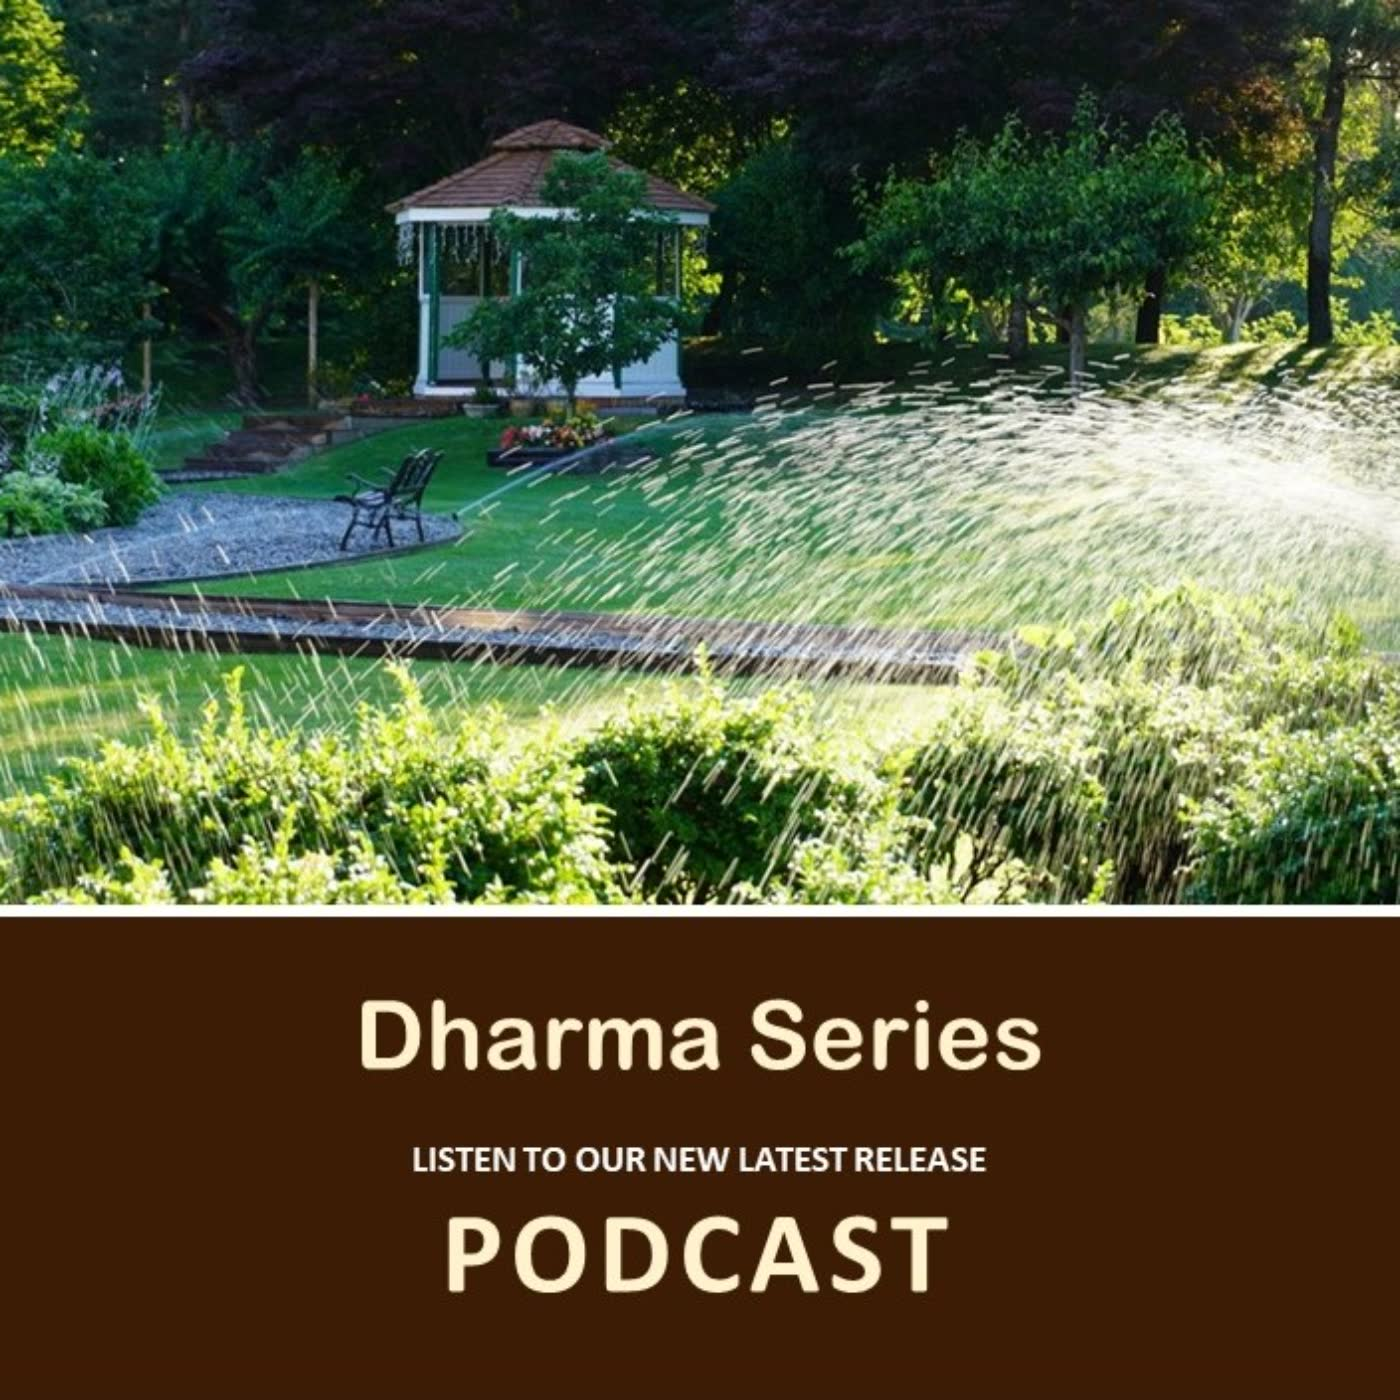 LingYen Mountain Temple Canada - Dharma Series